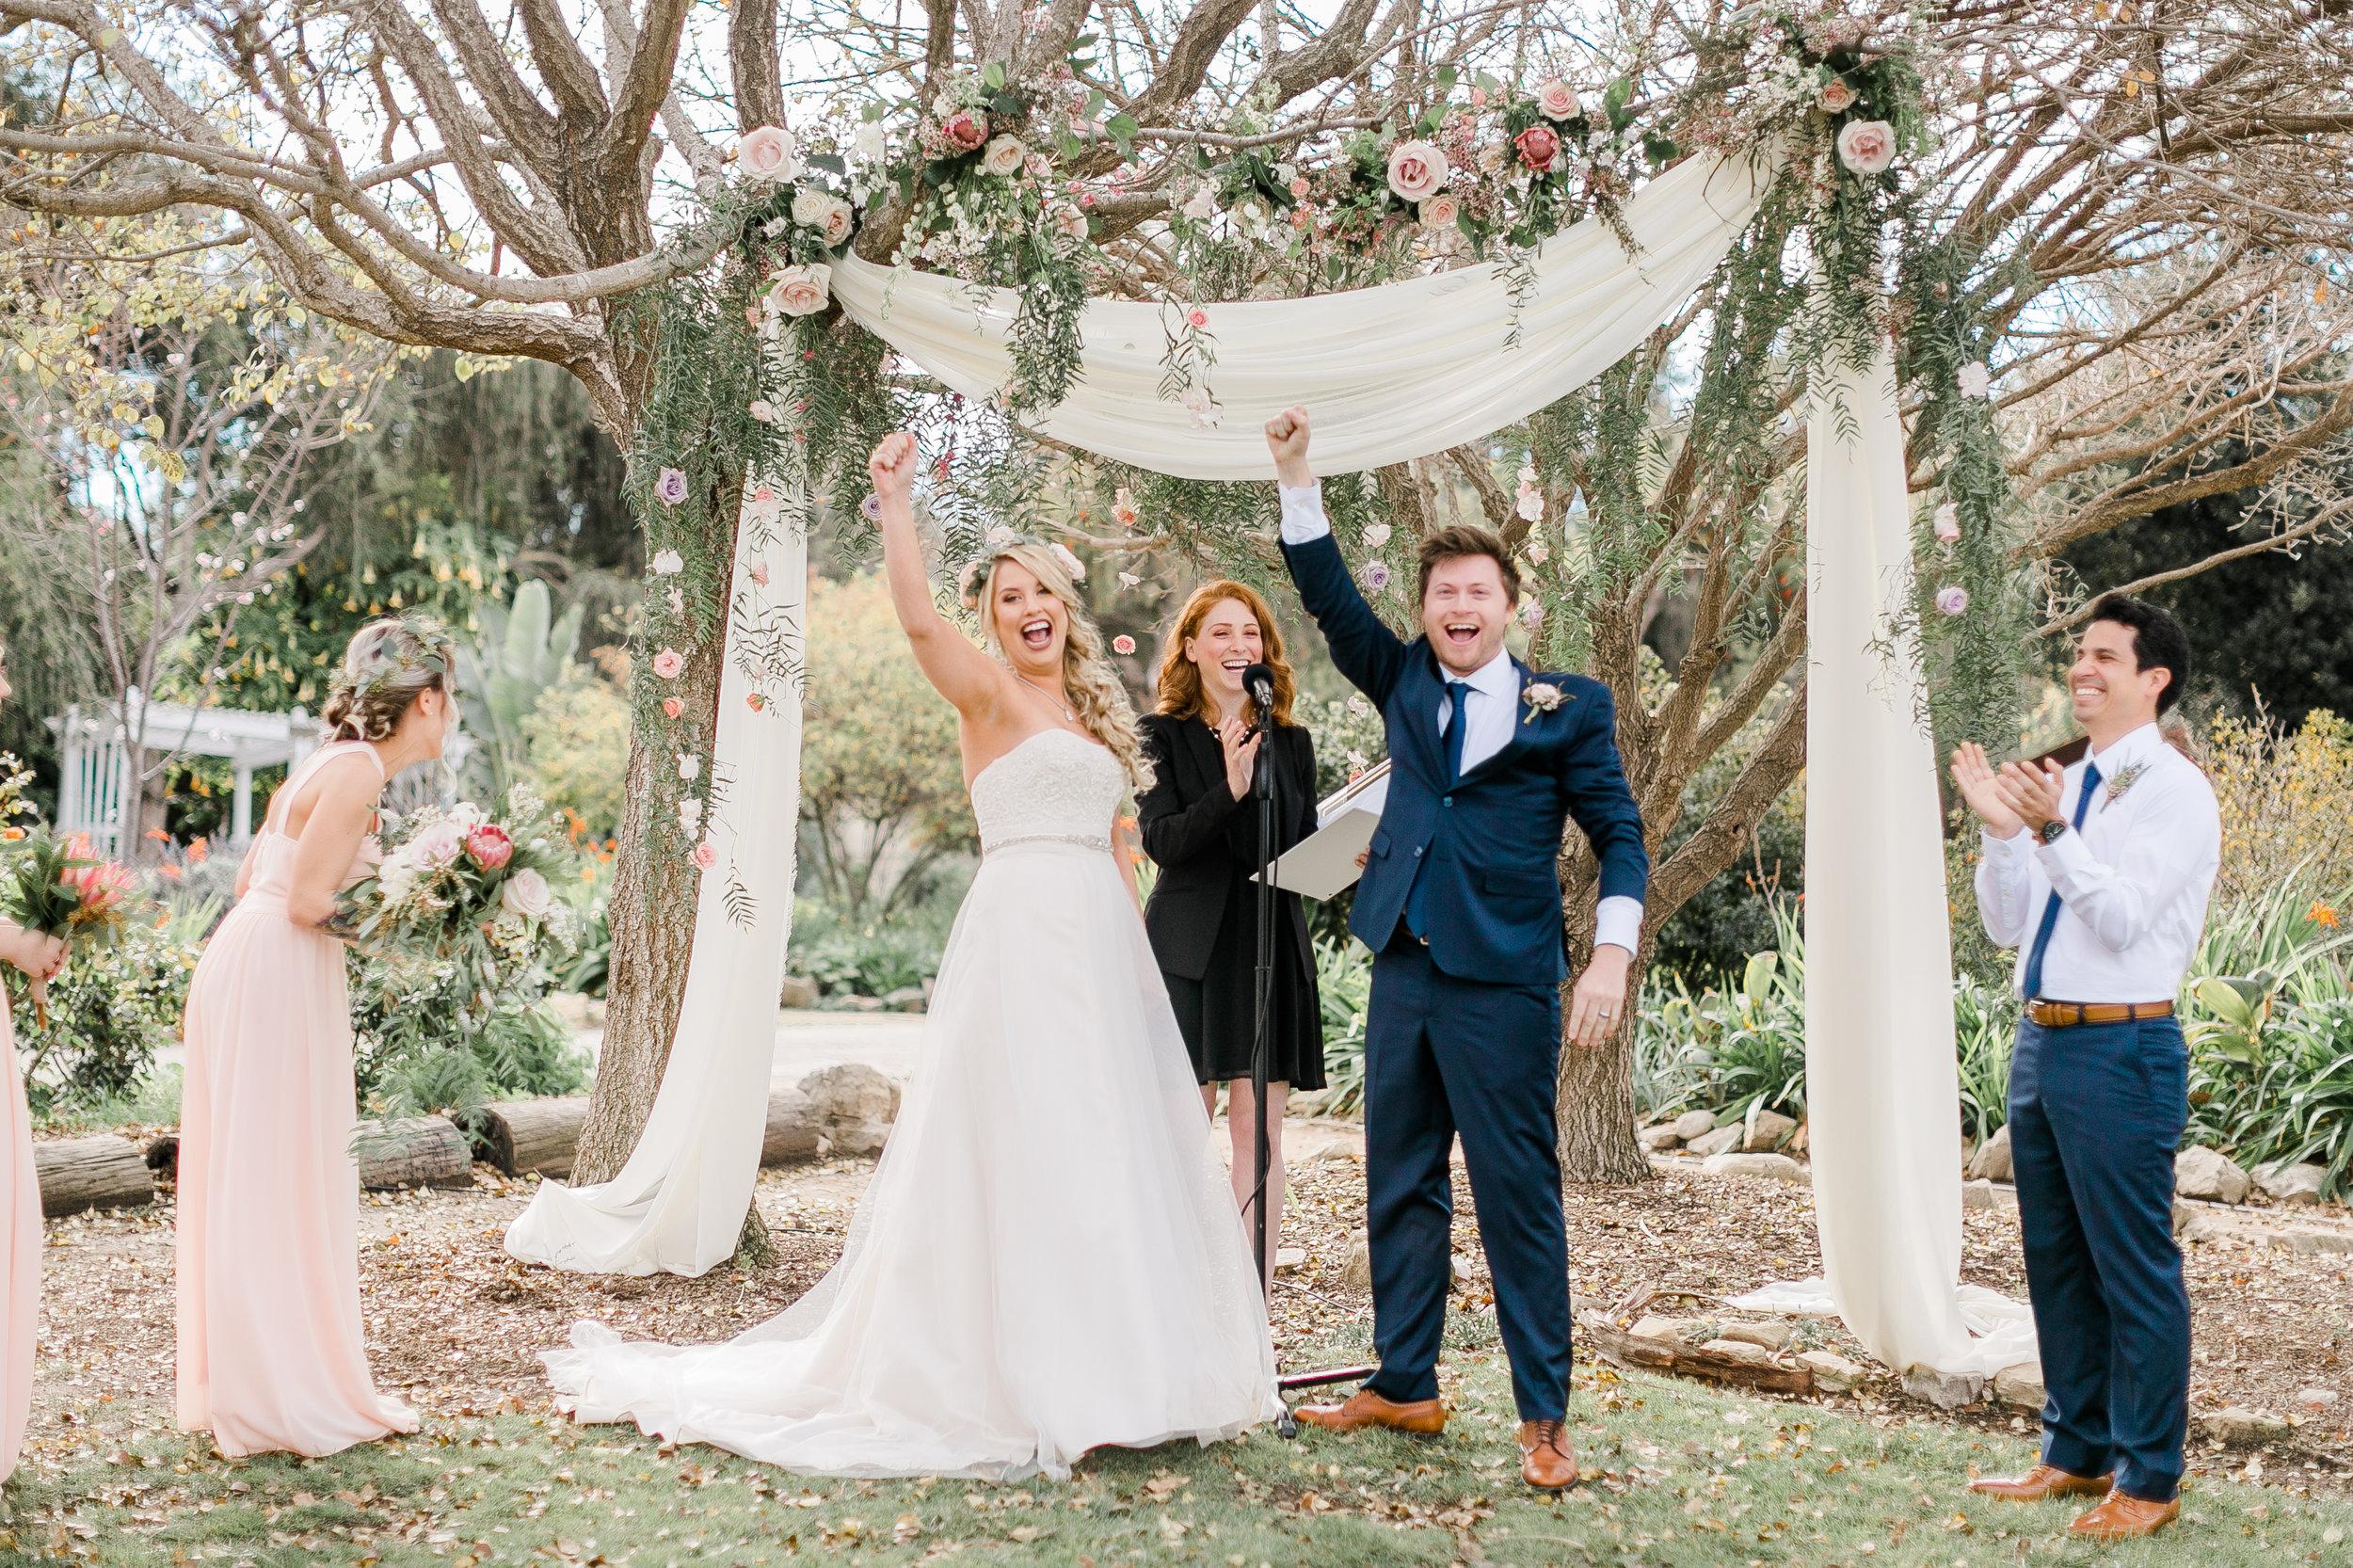 South-Coast-Botanic-Garden-Wedding-Planner32.jpg